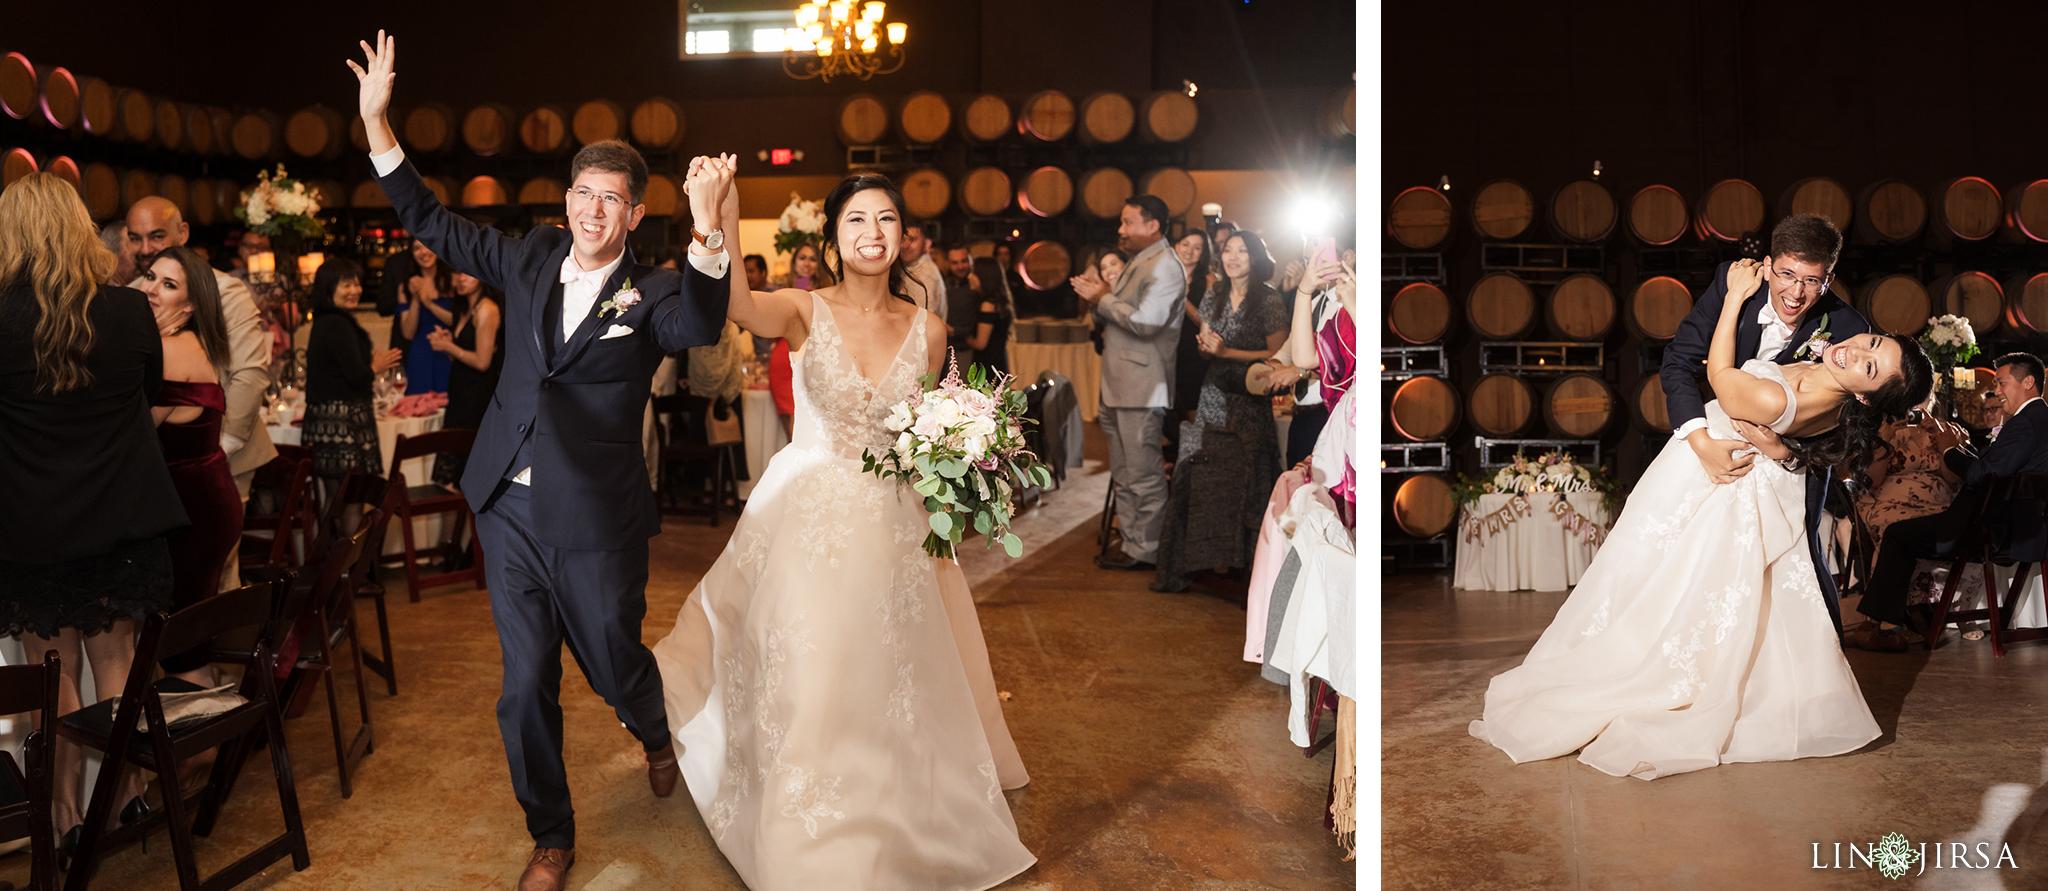 41 Leoness Cellars Temecula Wedding Photography